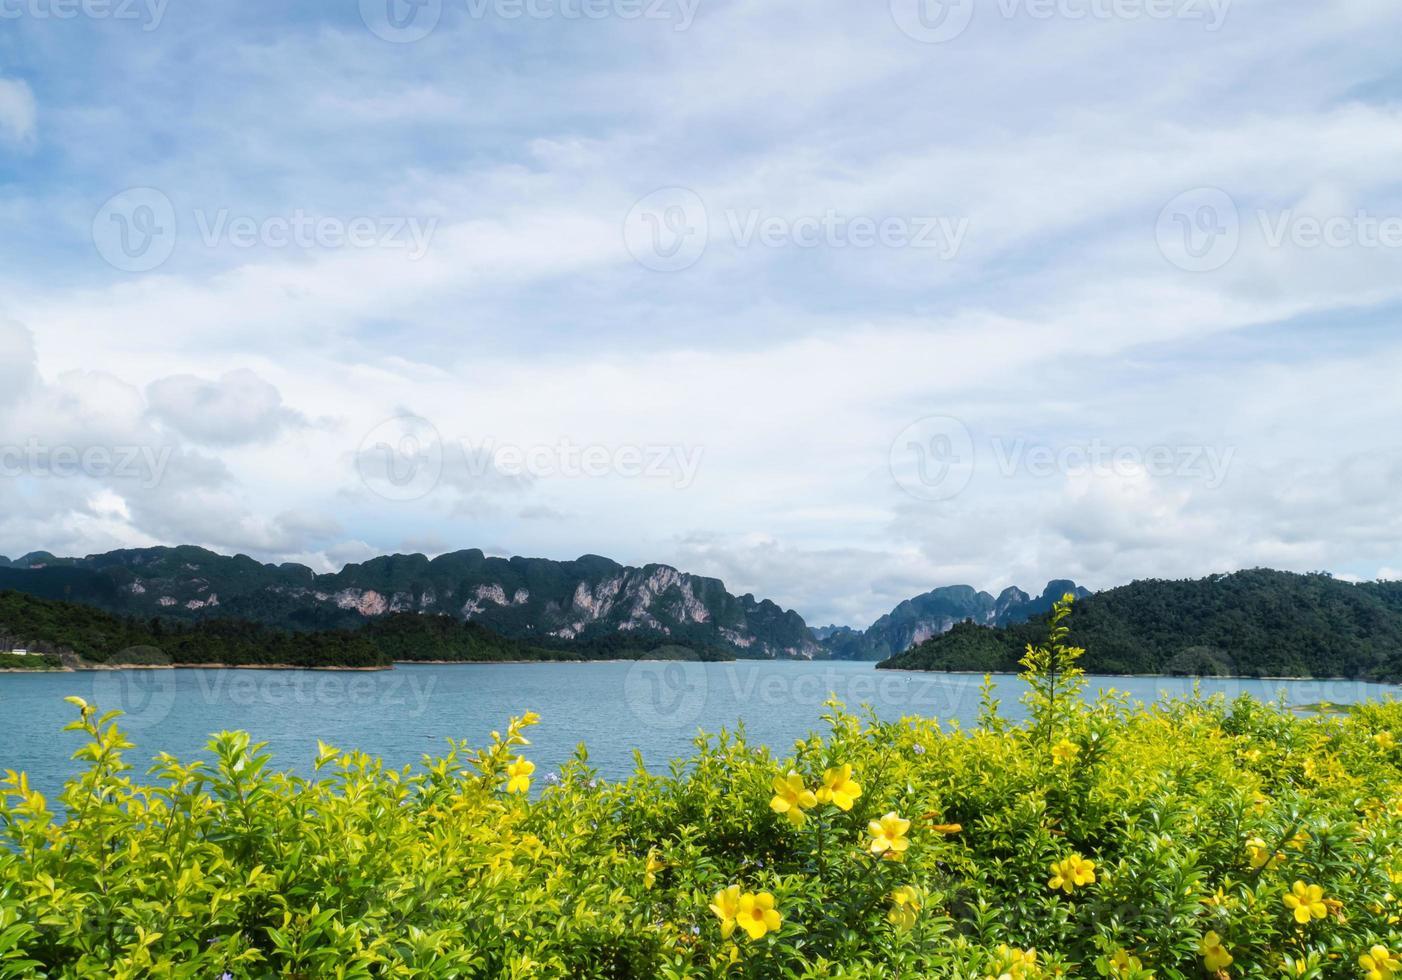 rio e montanhas barragem de ratchaprapha província de surat thani, thaila foto